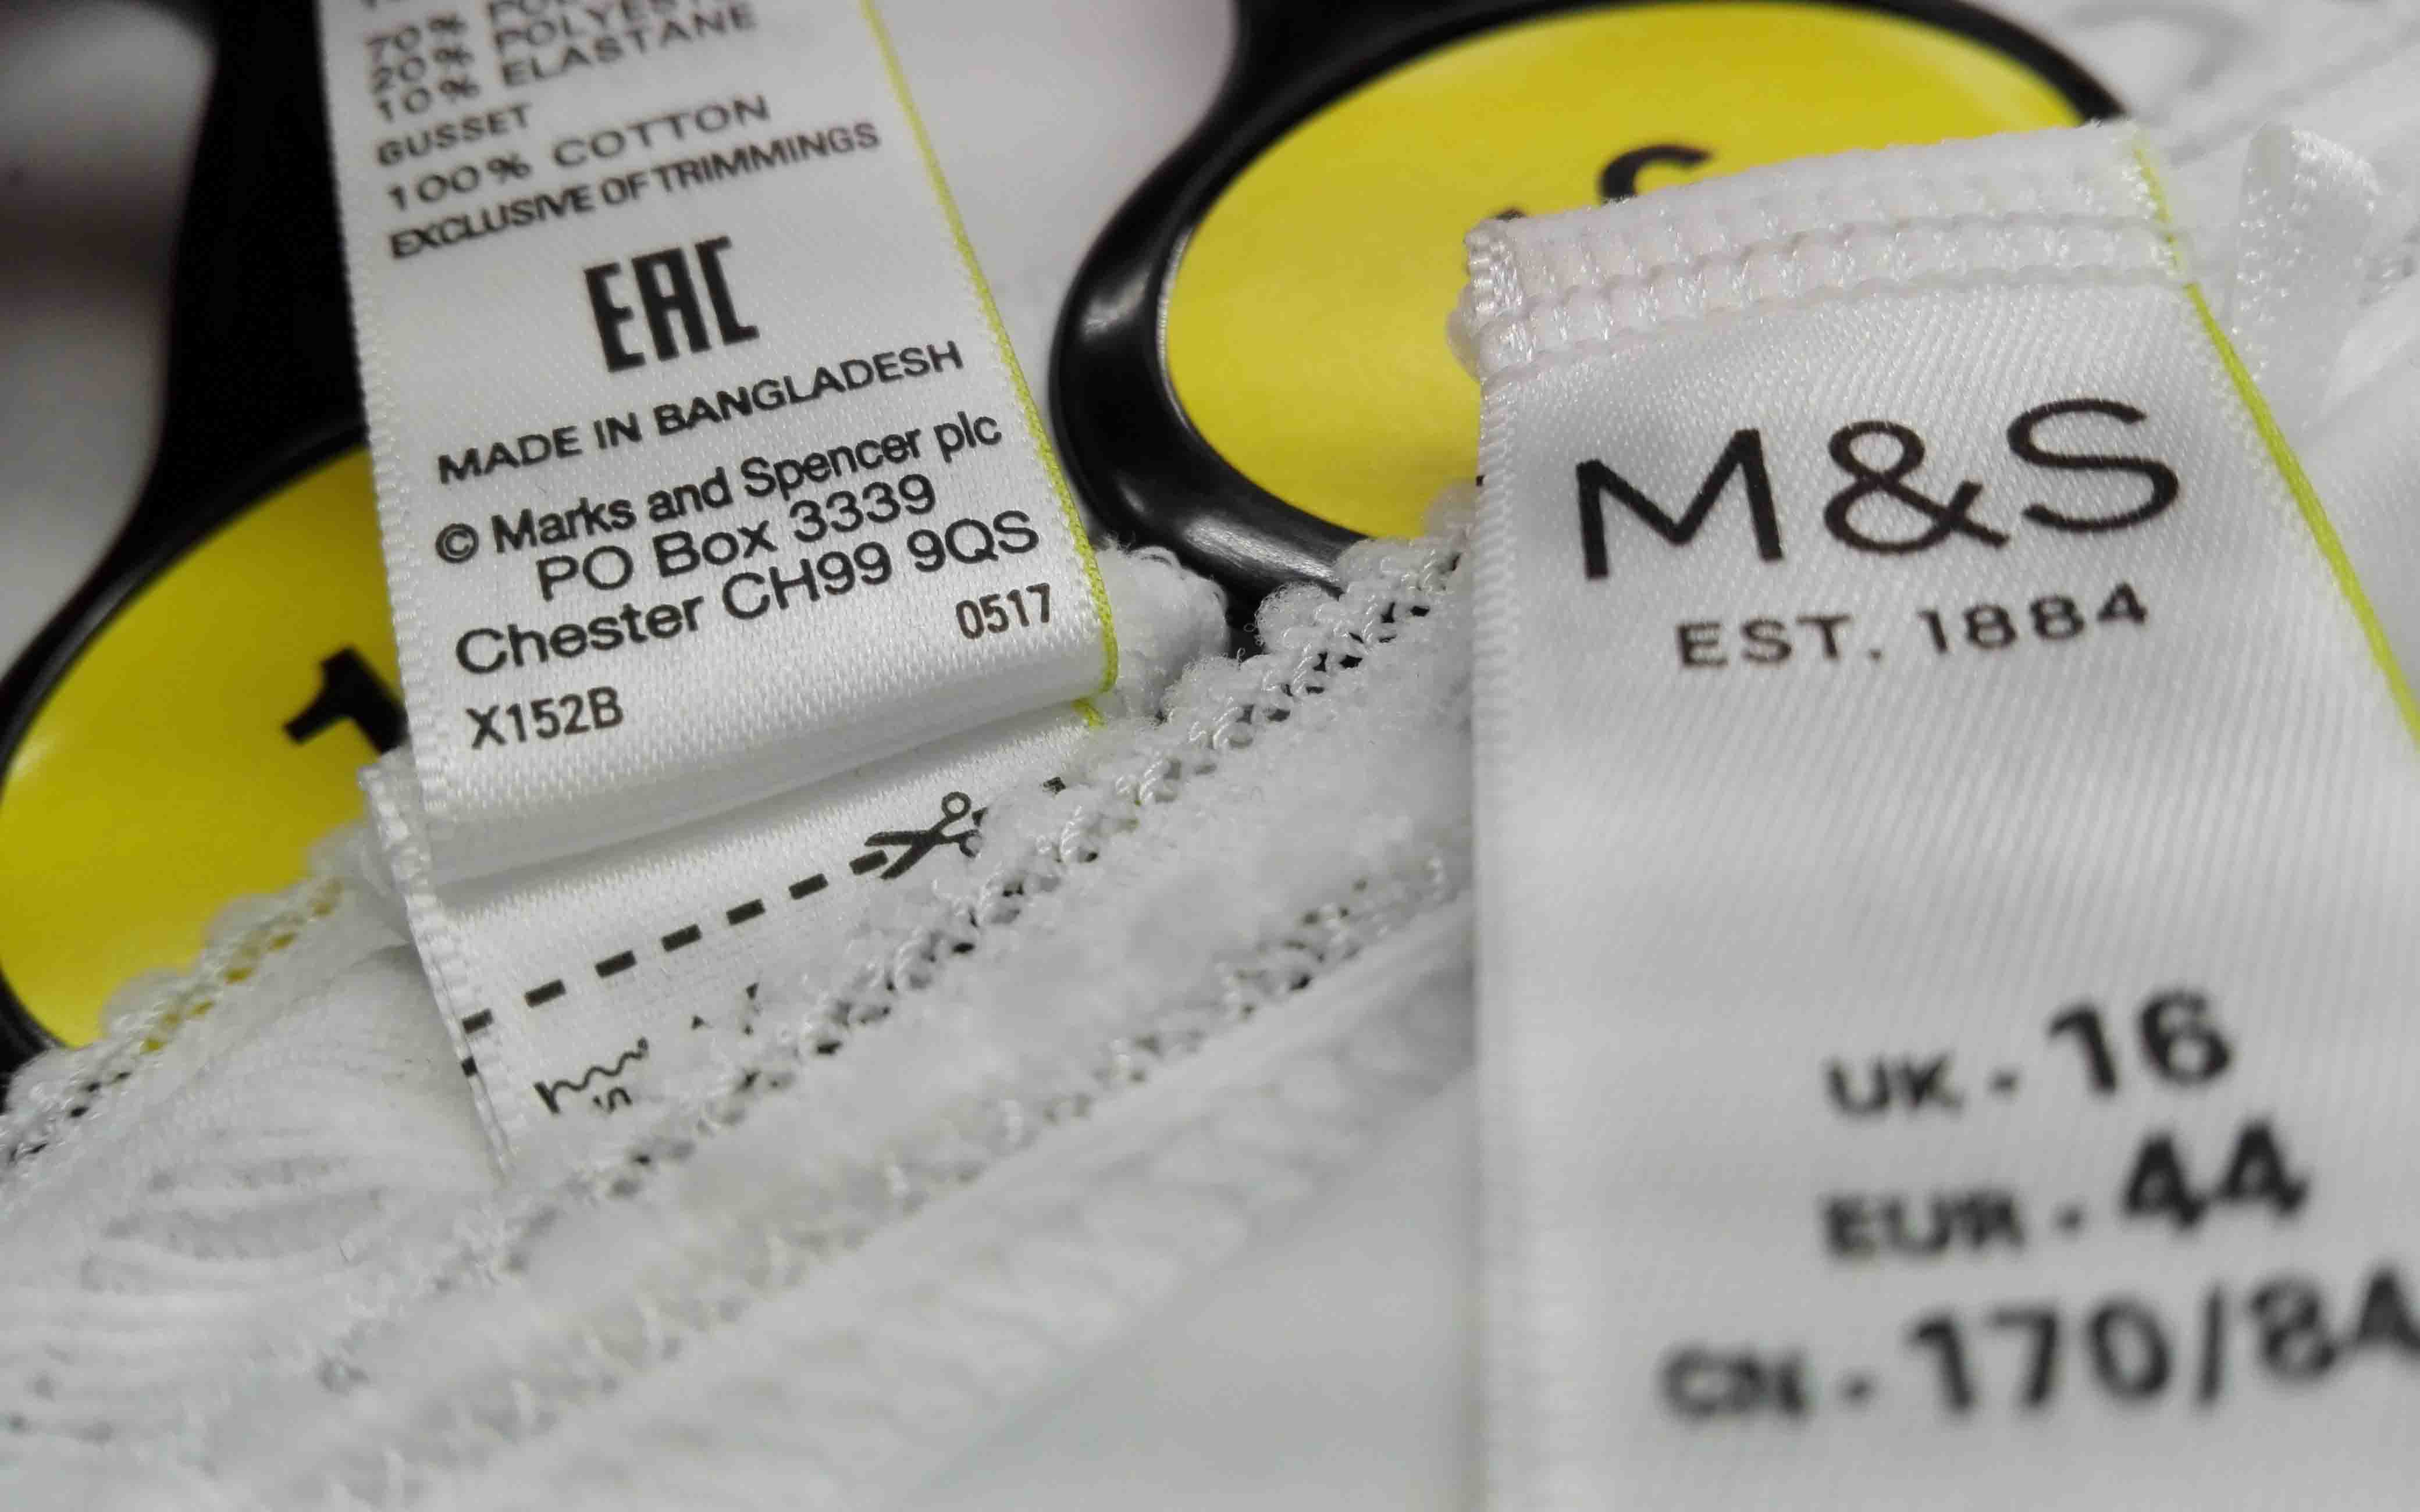 Made in Bangladesh (M&S)